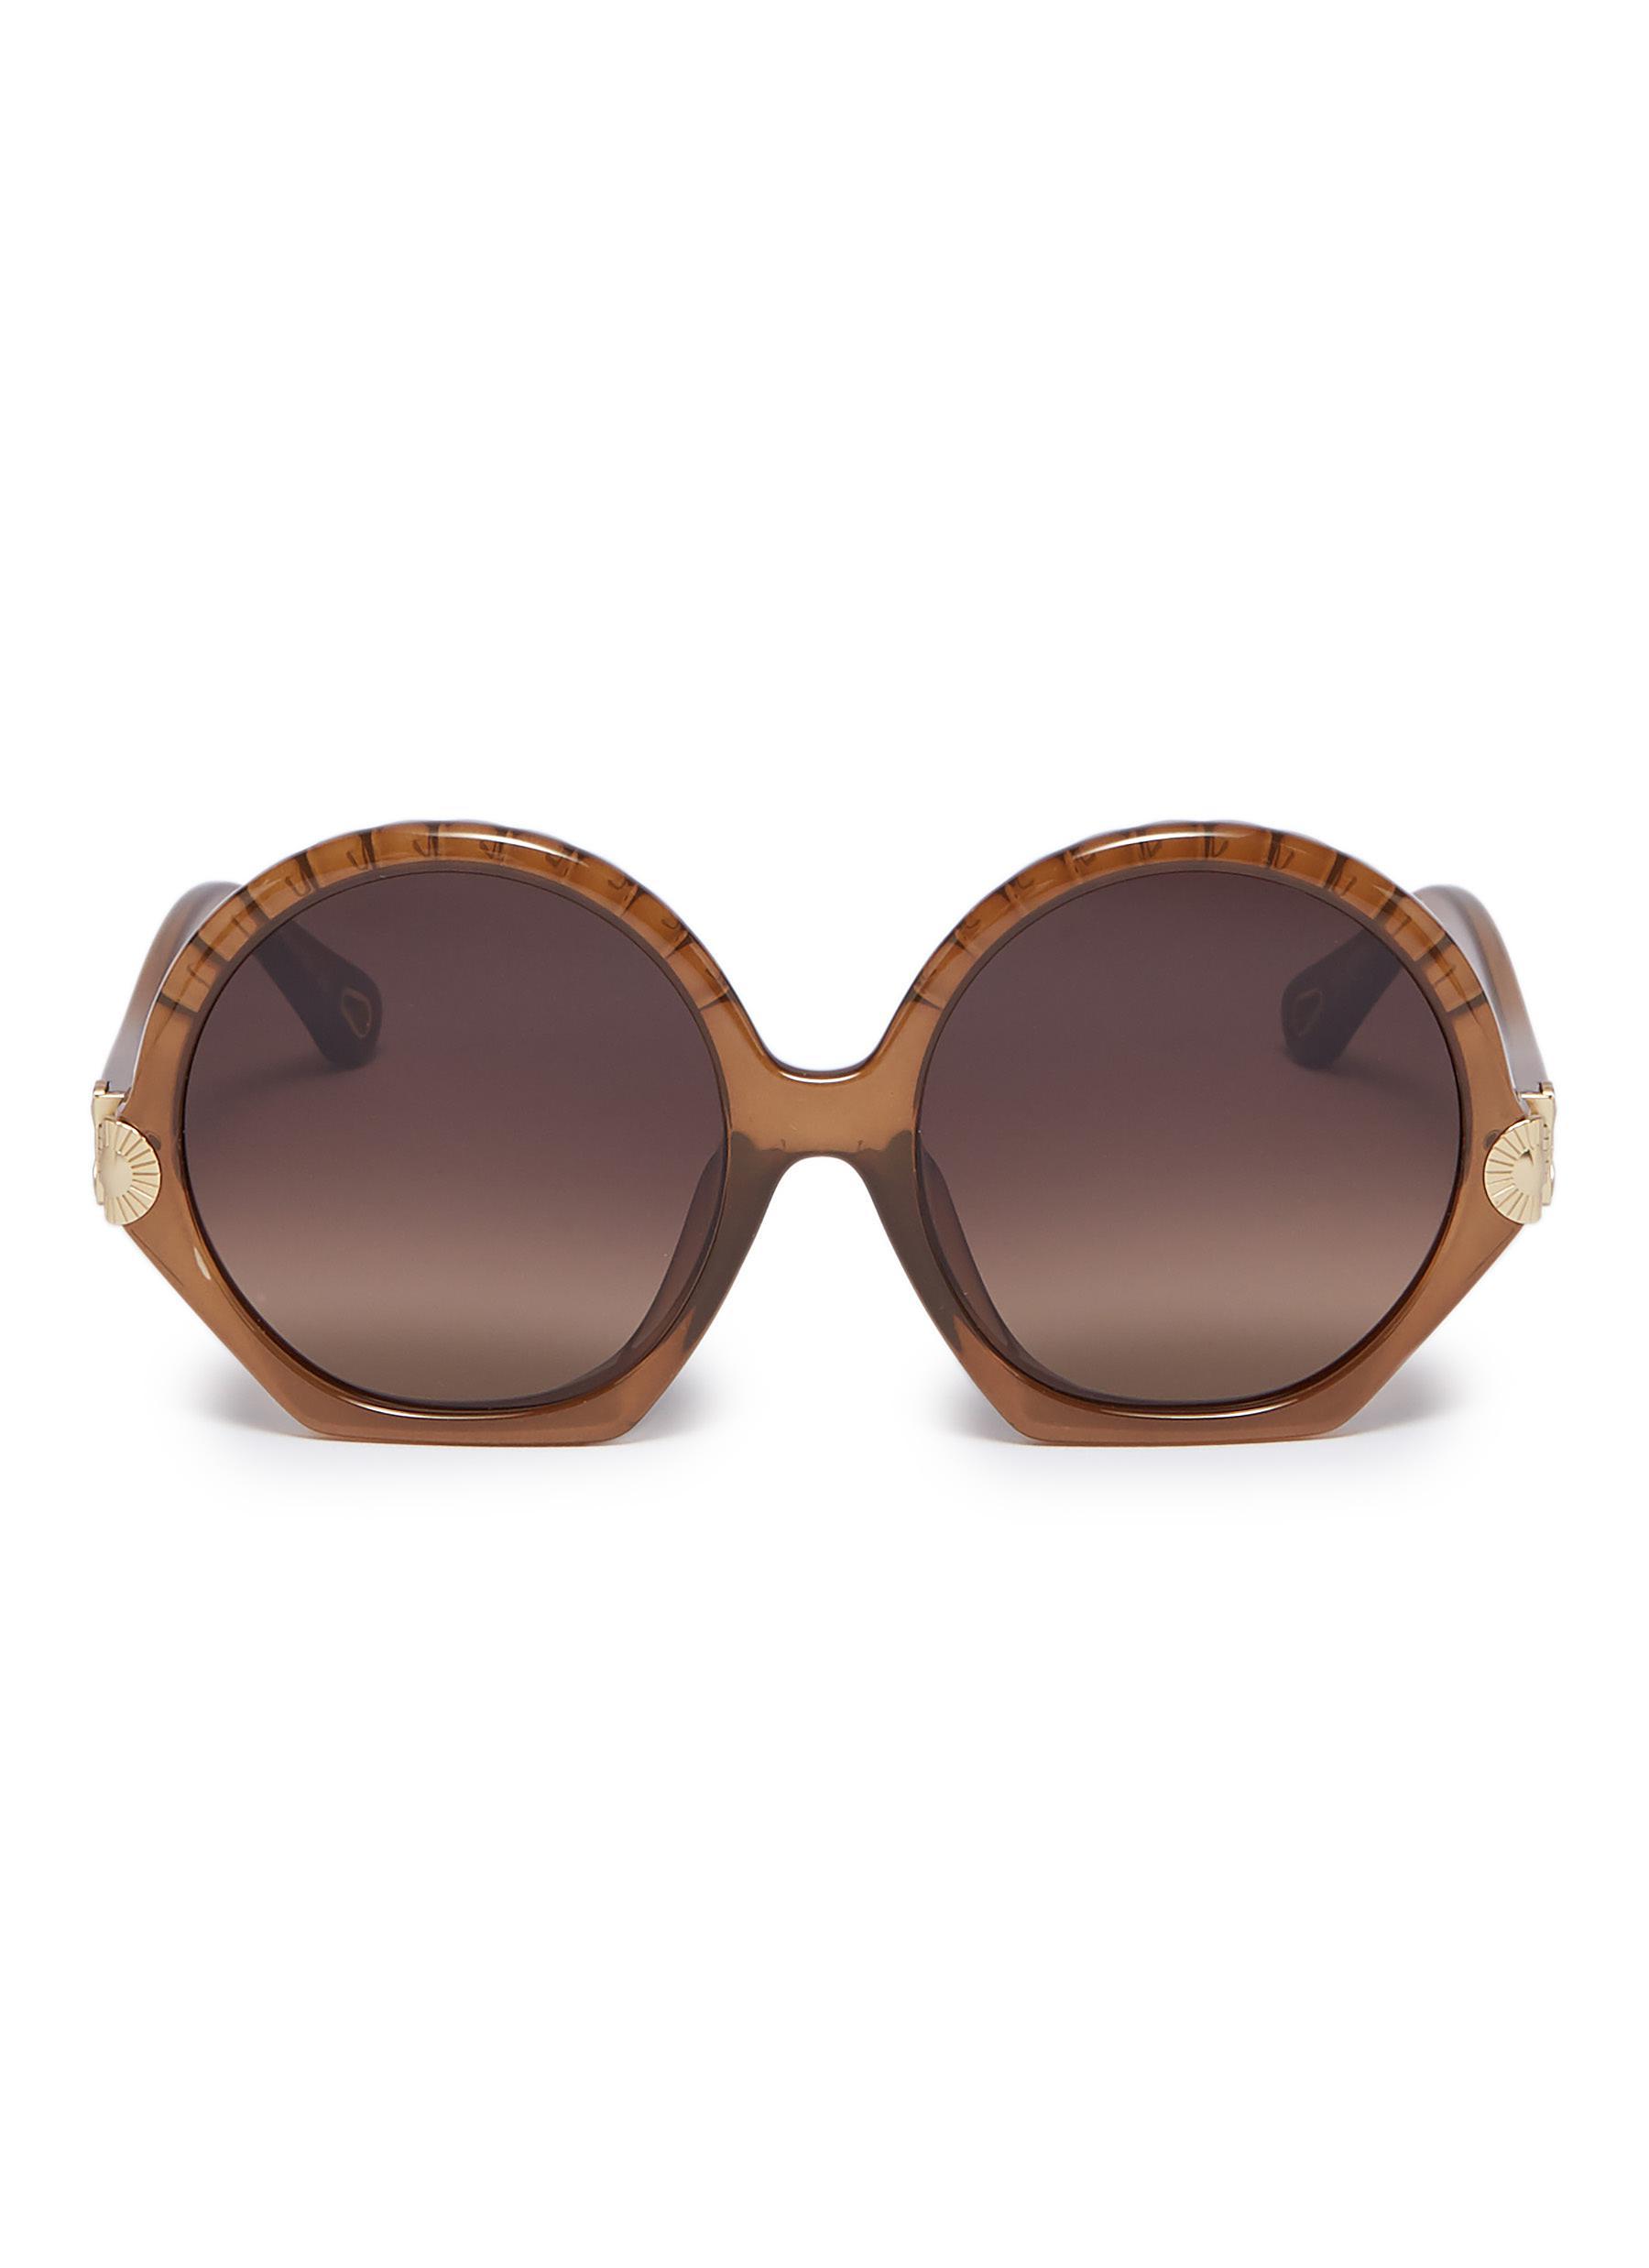 bc473a73f CHLOÉ | 'Vera' acetate scalloped round sunglasses | Women | Lane ...